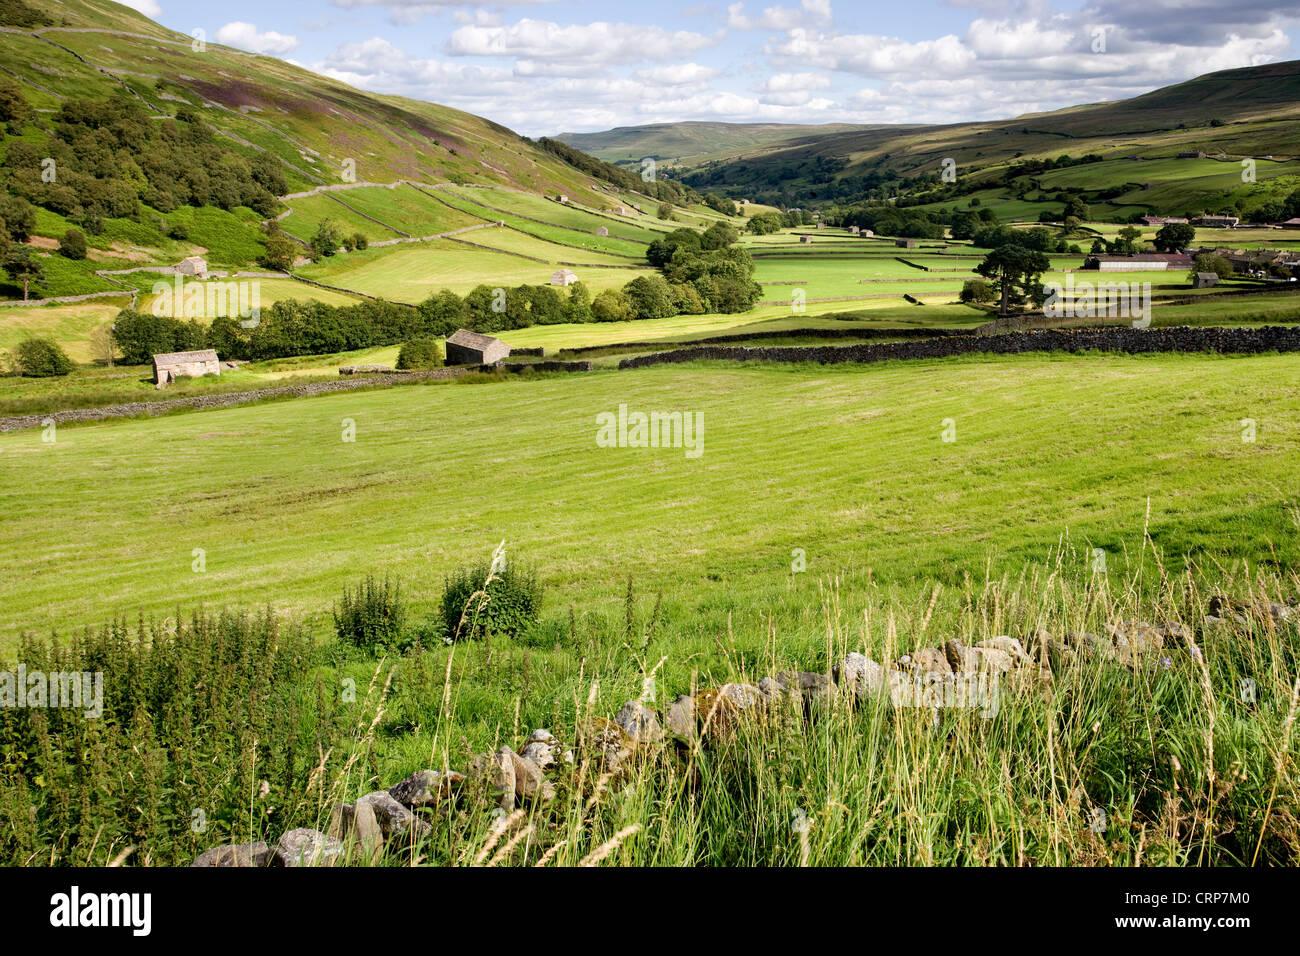 Field barns near Kisdon hill, Swaledale, North Yorkshire Dales, England - Stock Image